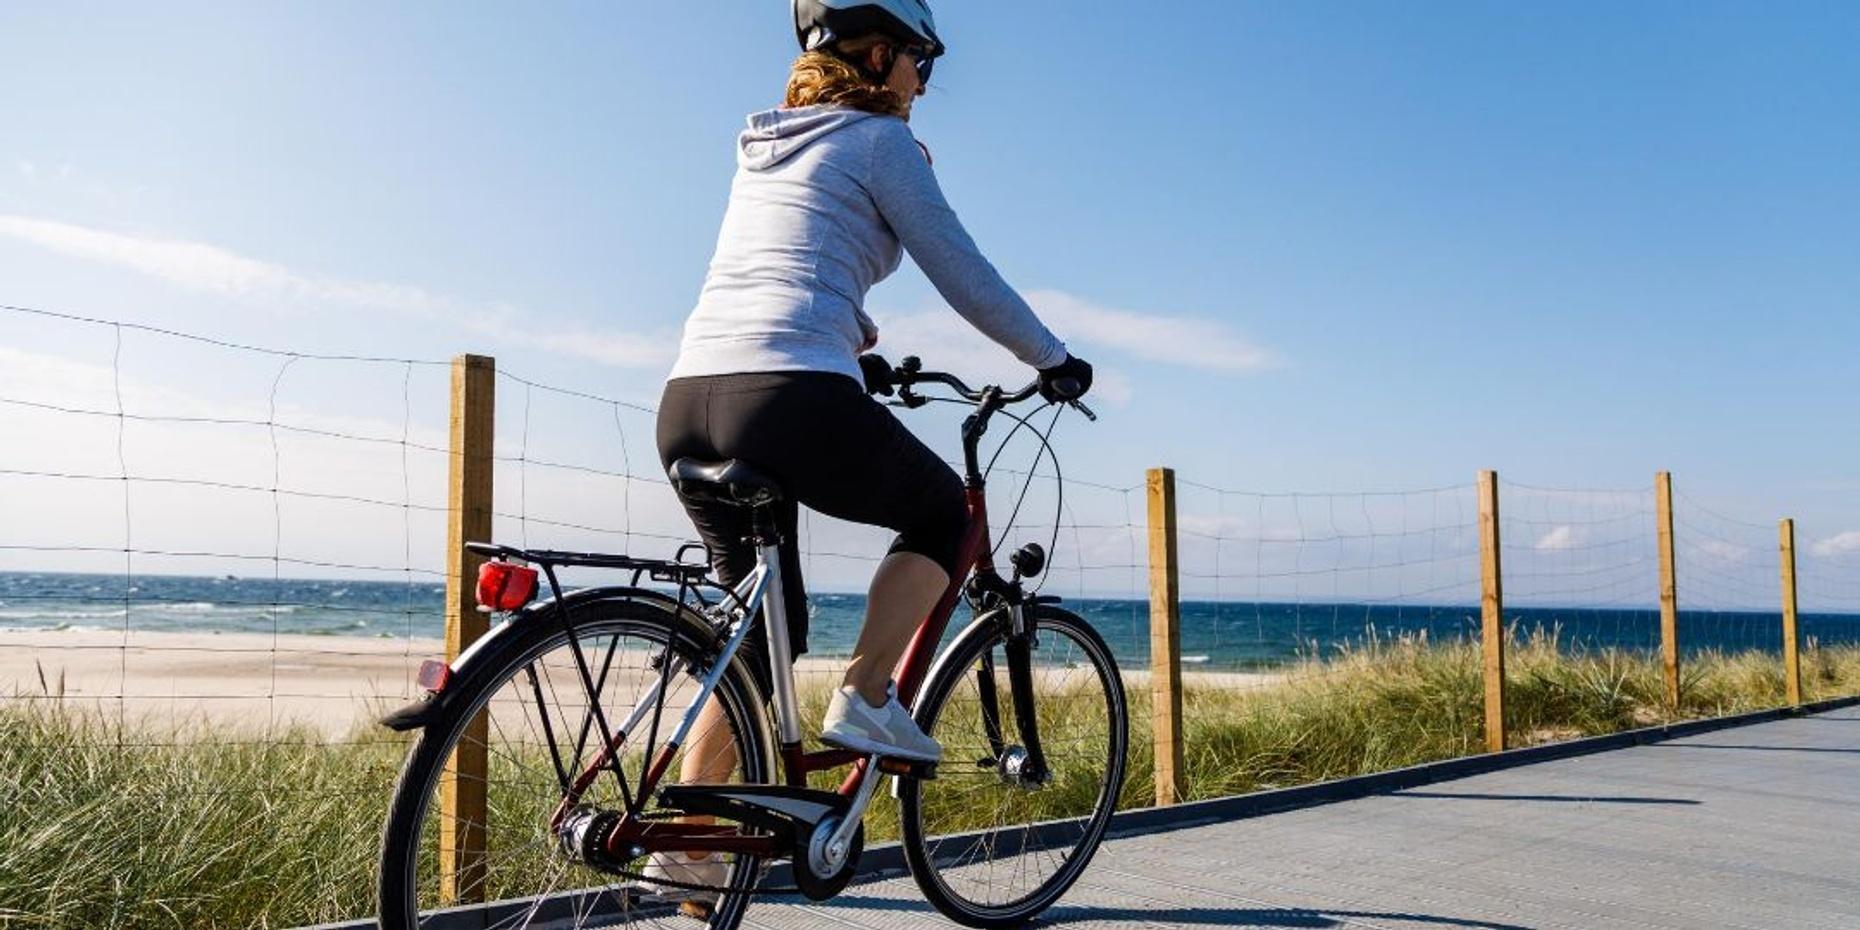 Bike Rental in Fort Lauderdale